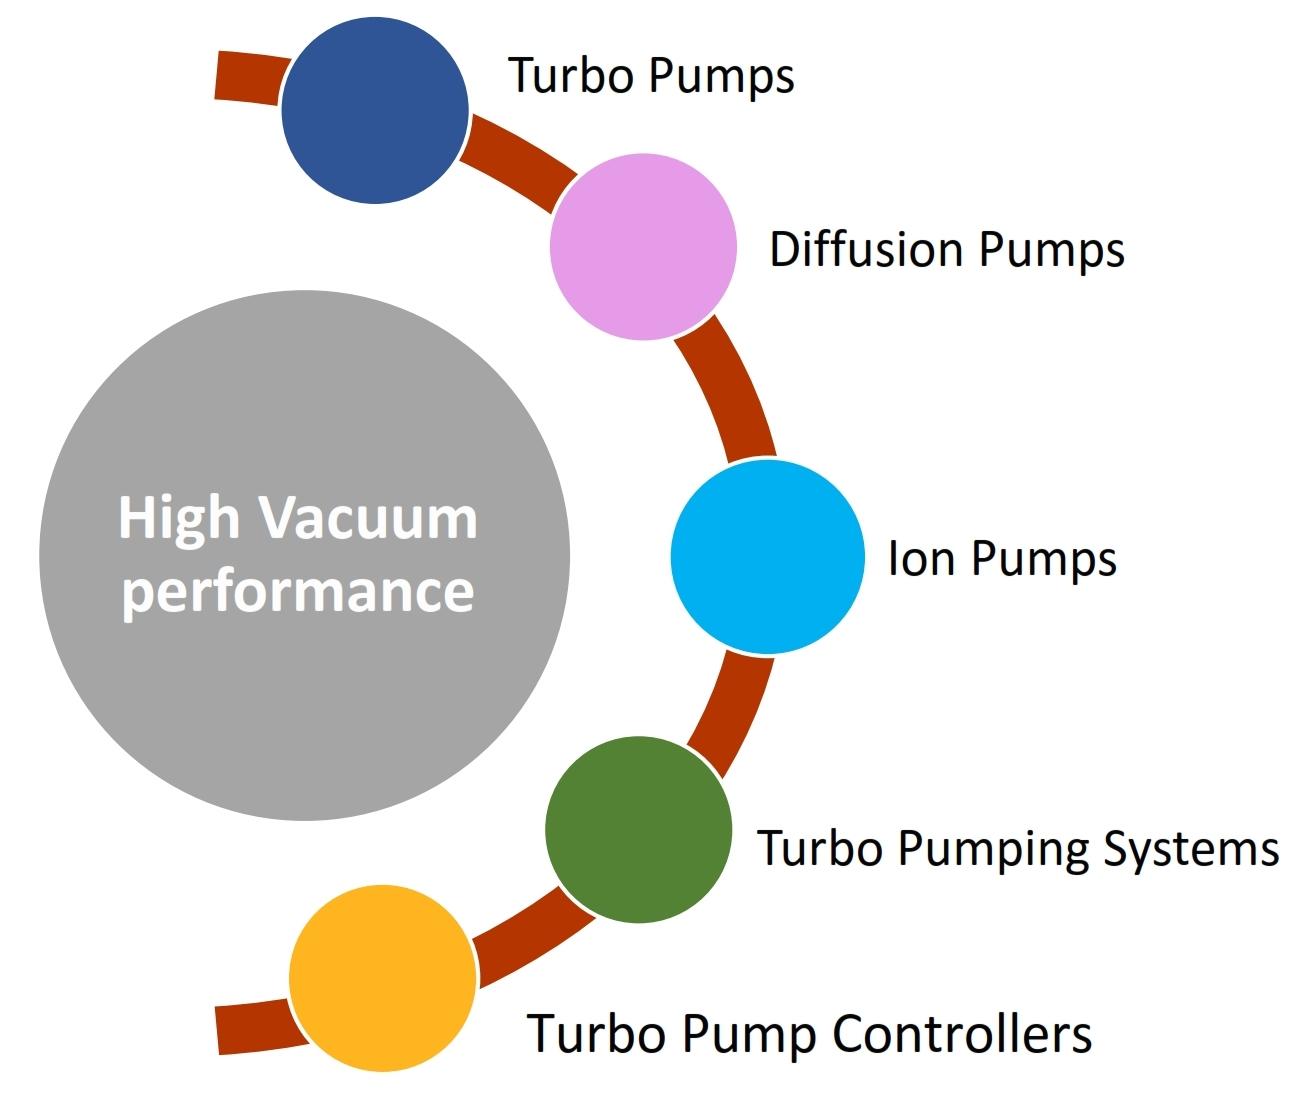 High Vacuum performance